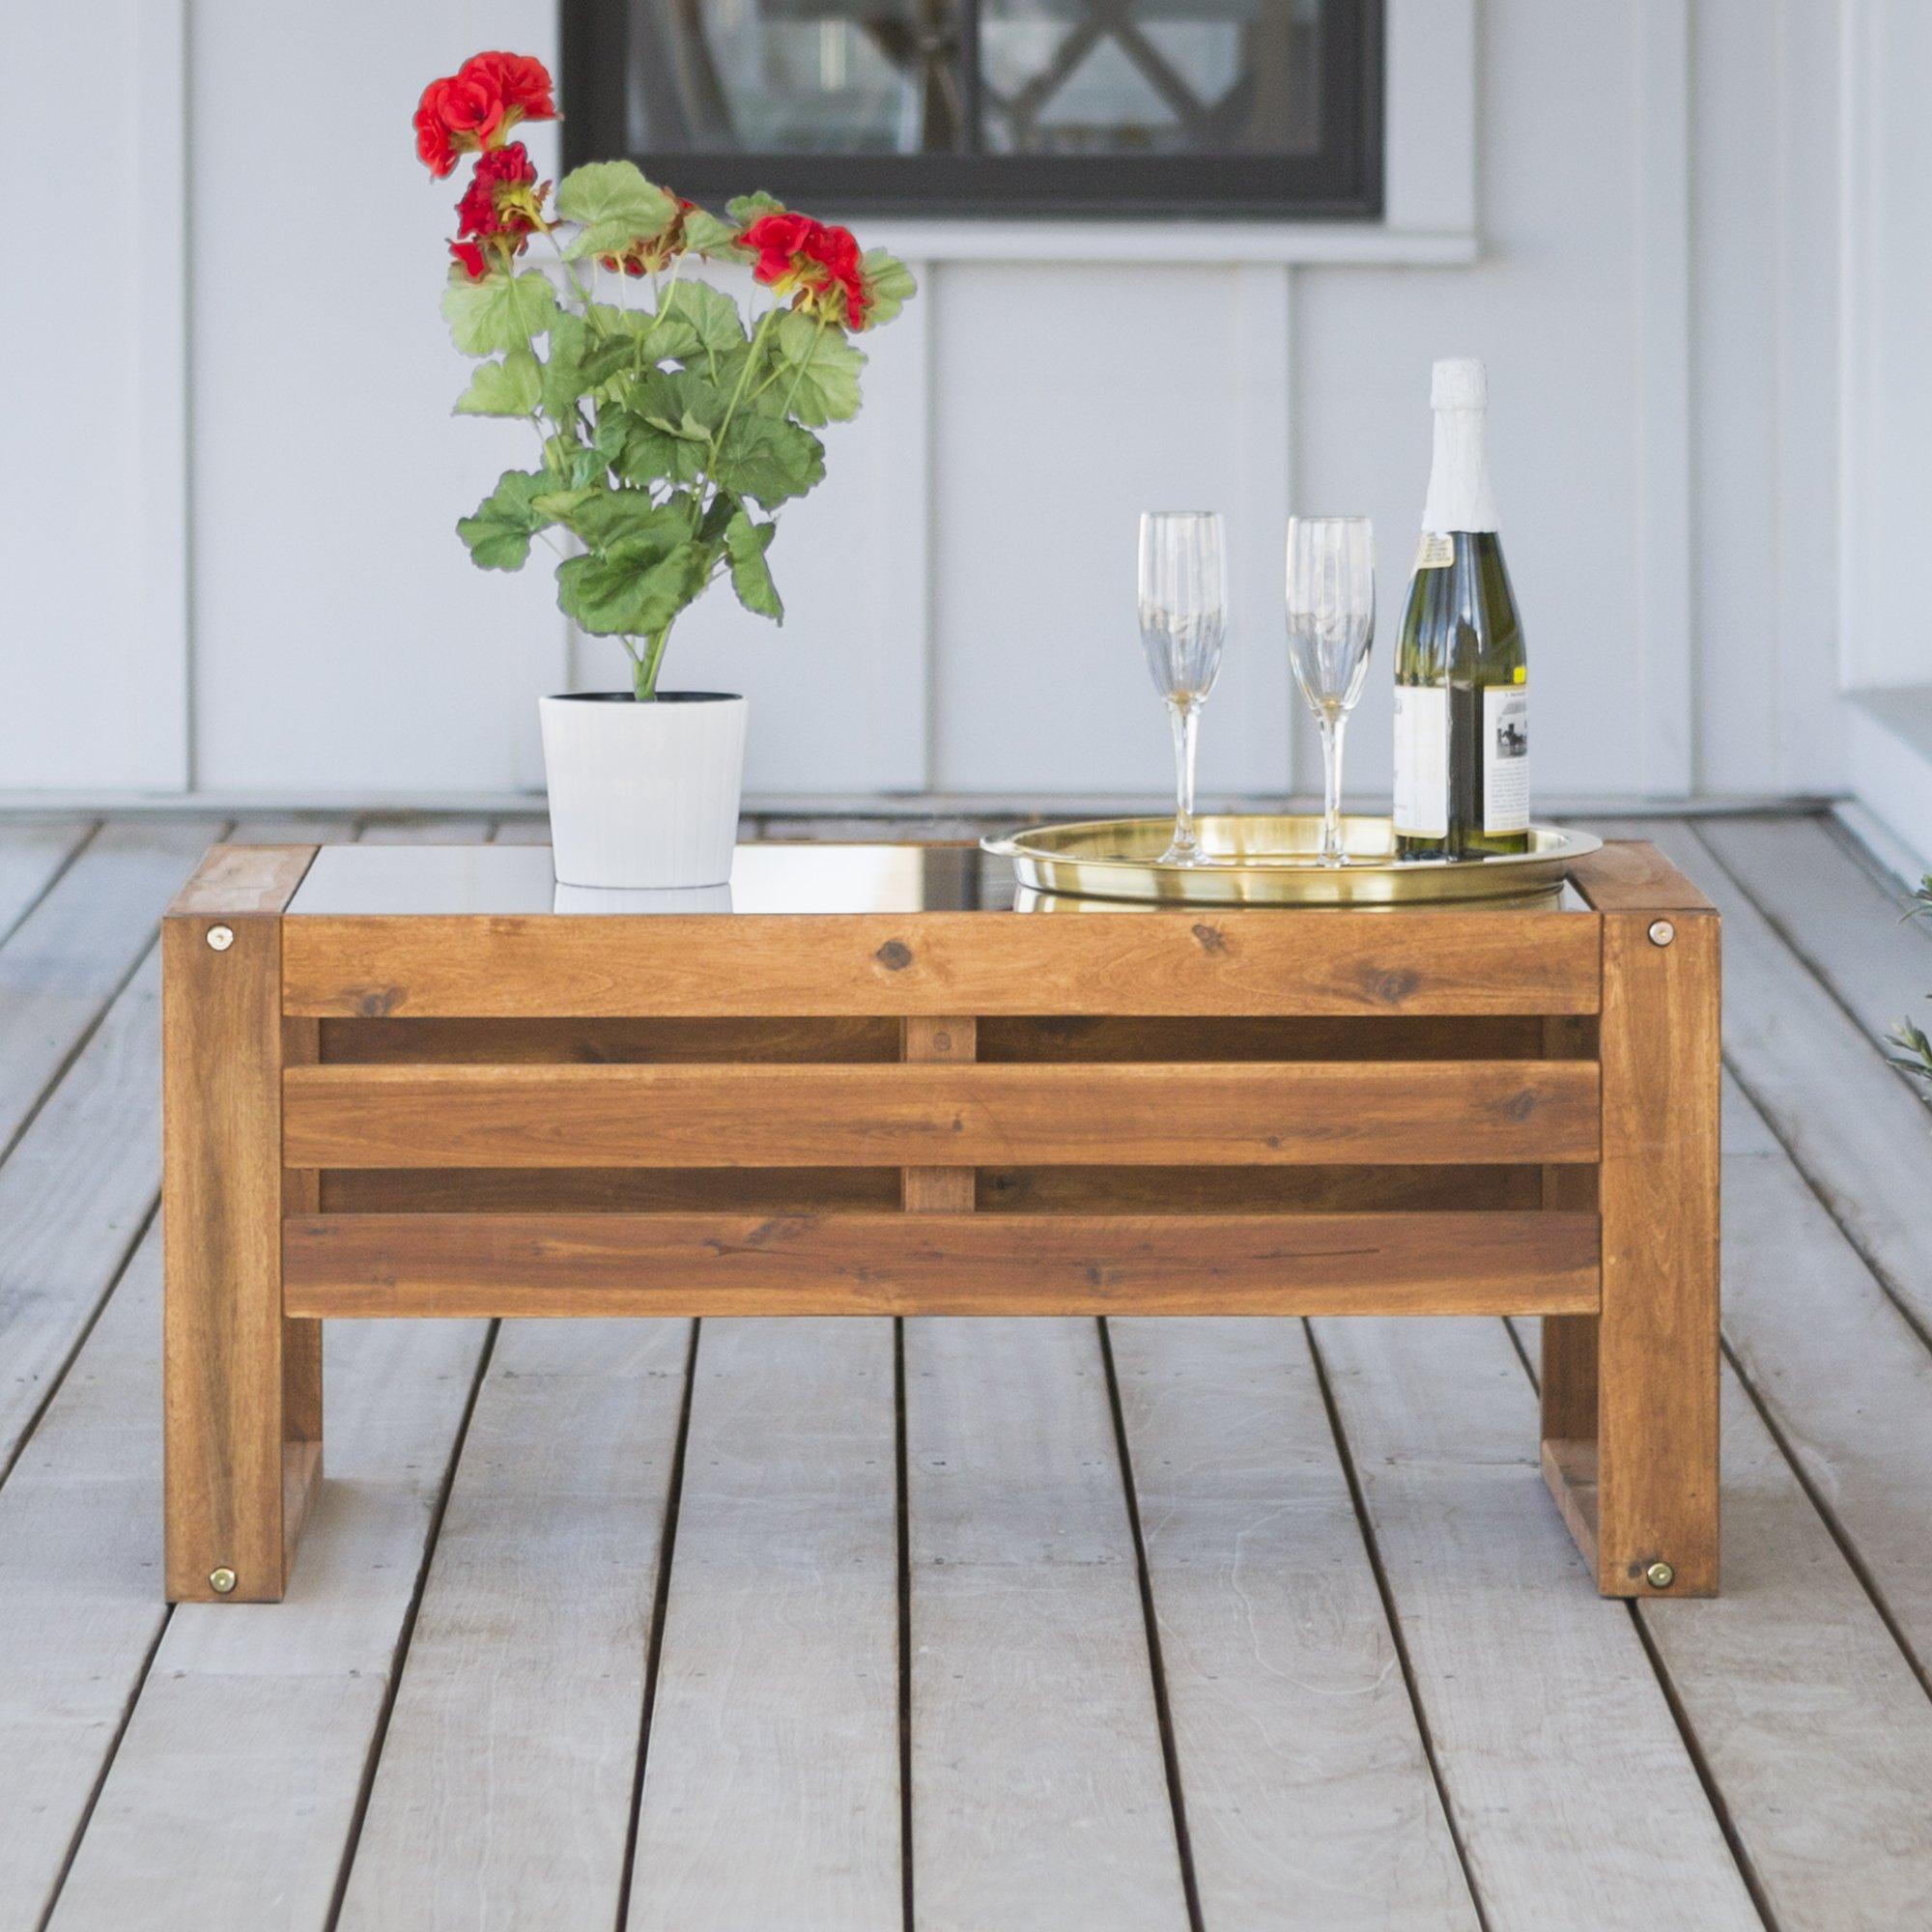 WE Furniture AZWOSCTBR Outdoor Coffee Table, 36'', Brown